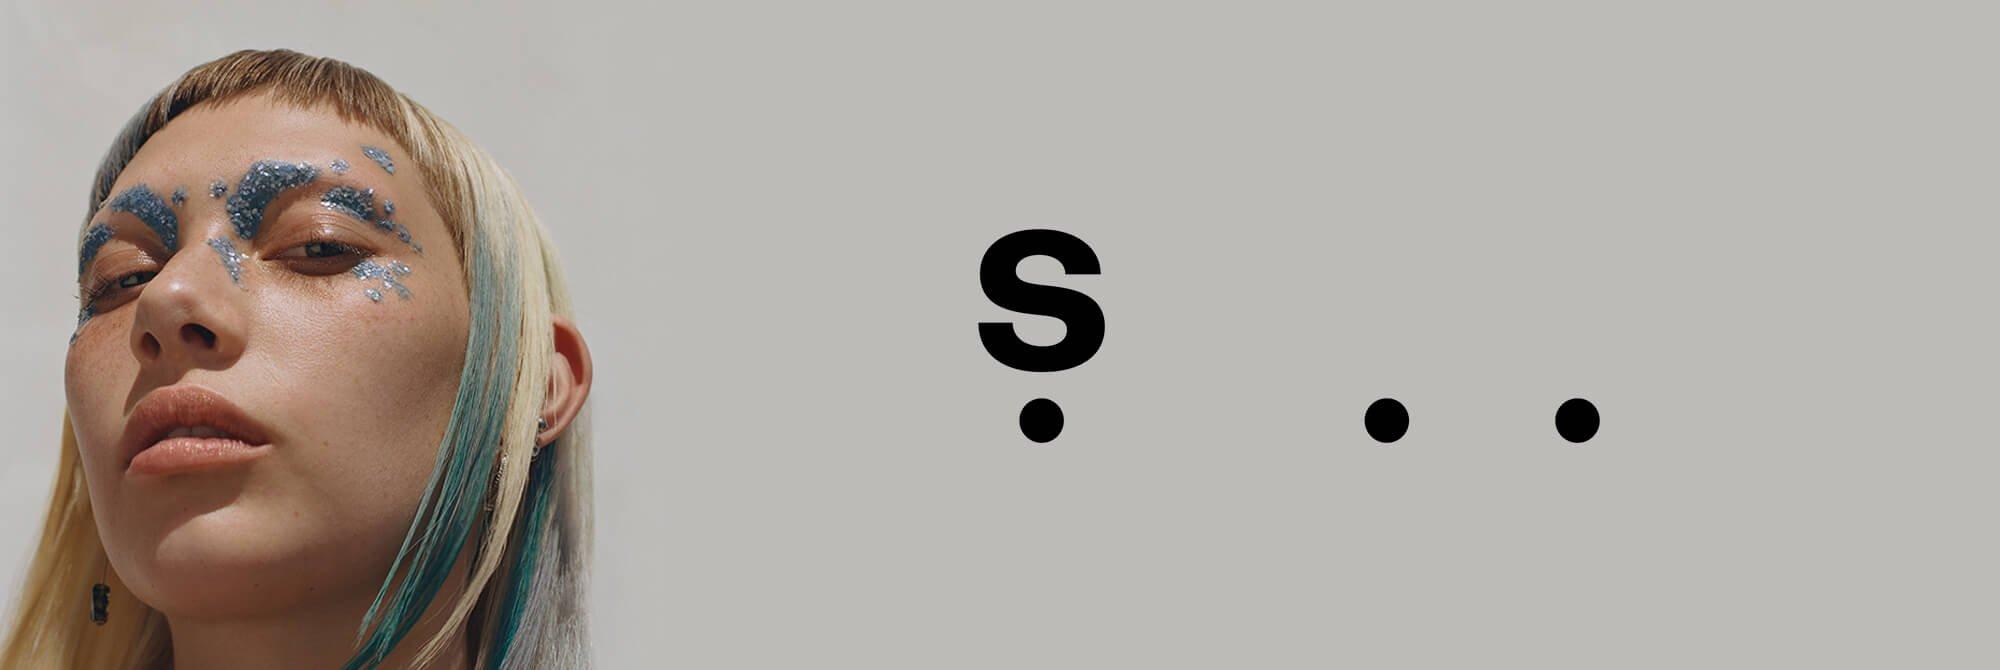 SubmissionBanner_02